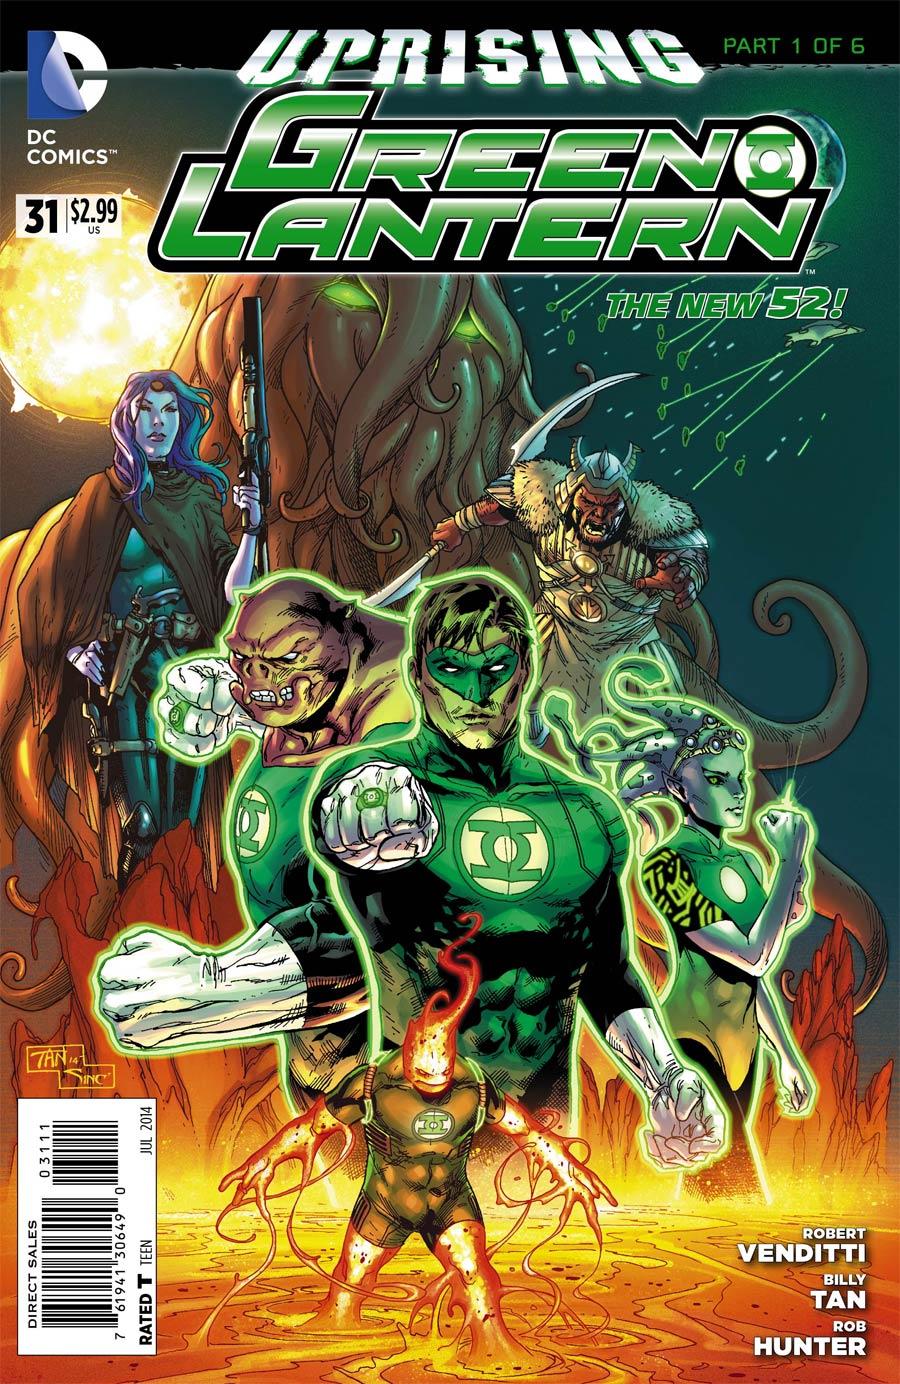 Green Lantern Vol 5 #31 Cover A Regular Billy Tan Cover (Uprising Part 1)